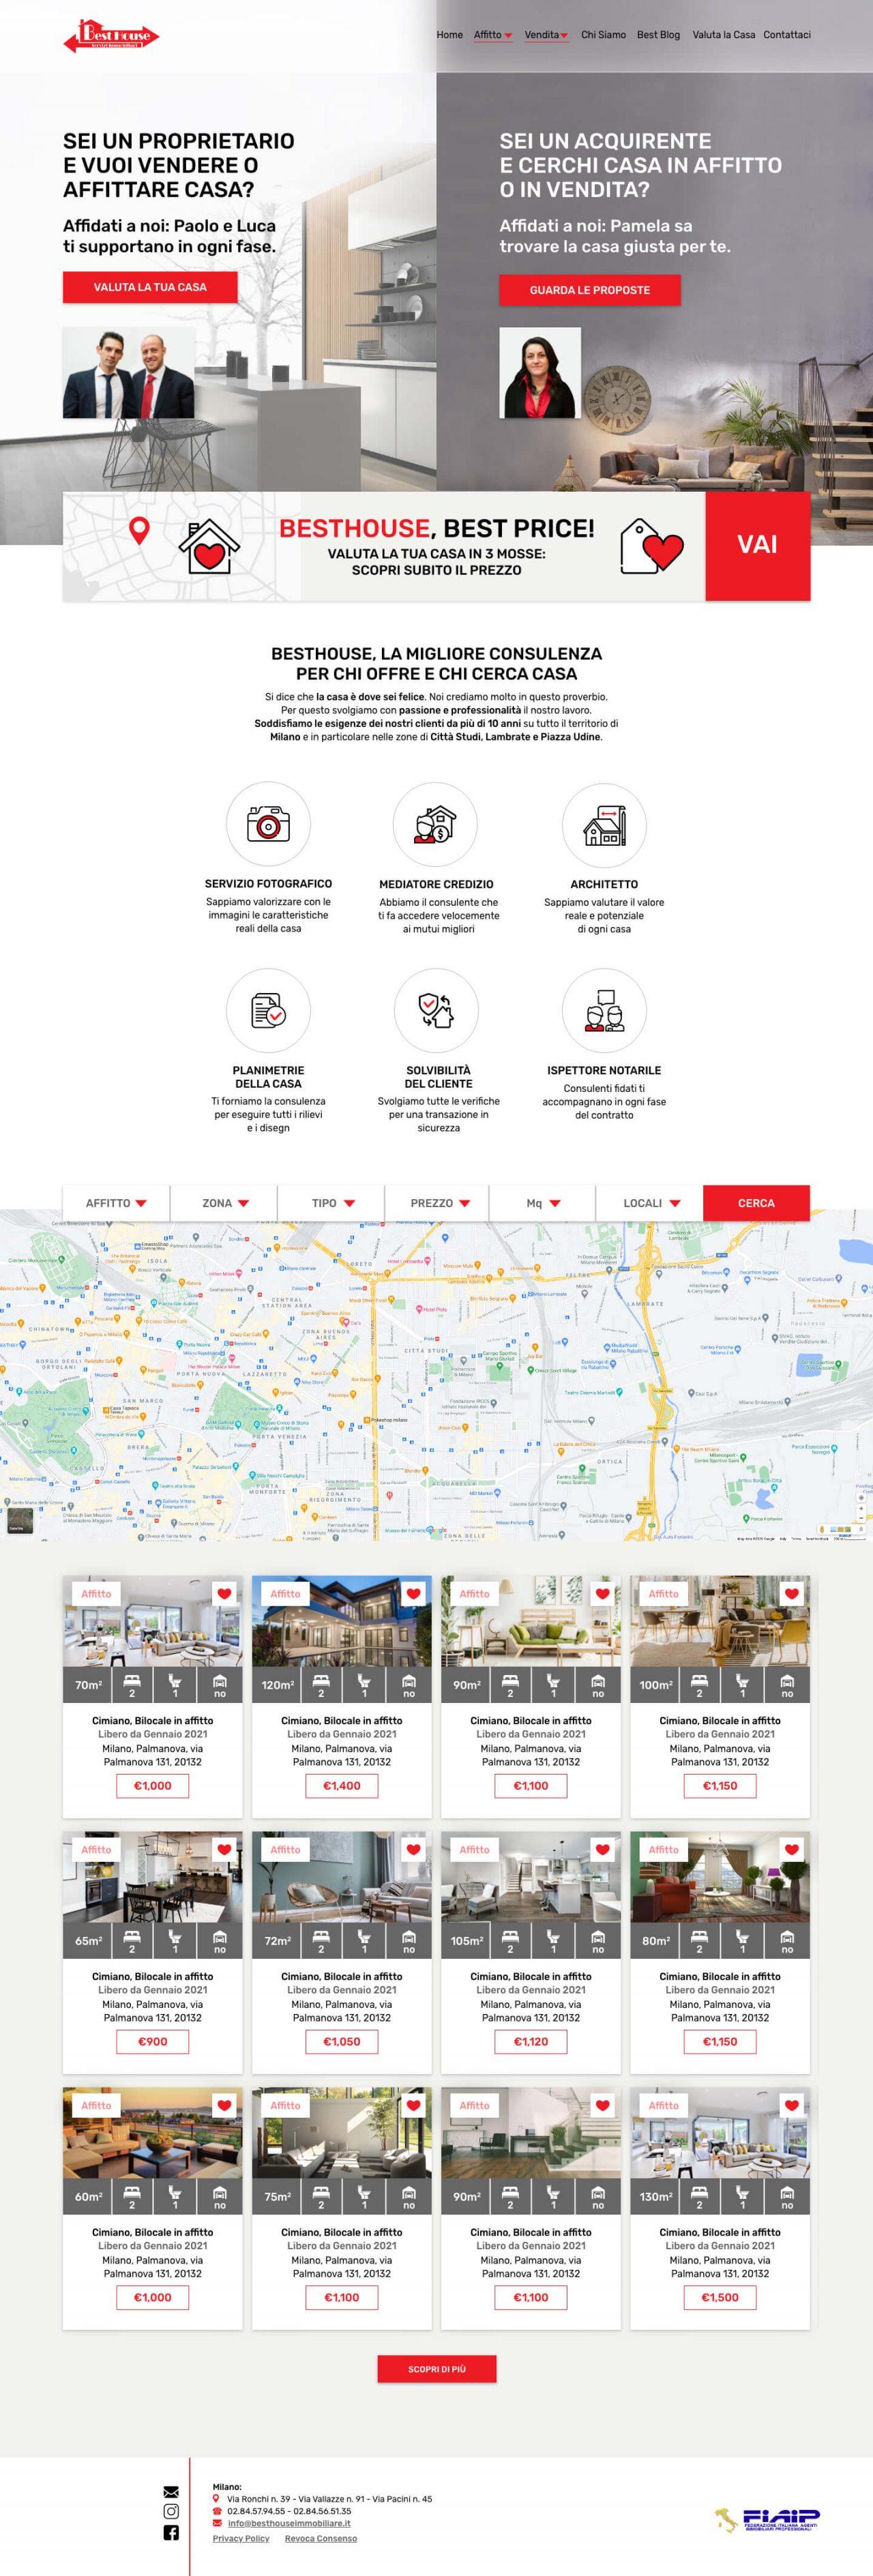 Best House - Web Design